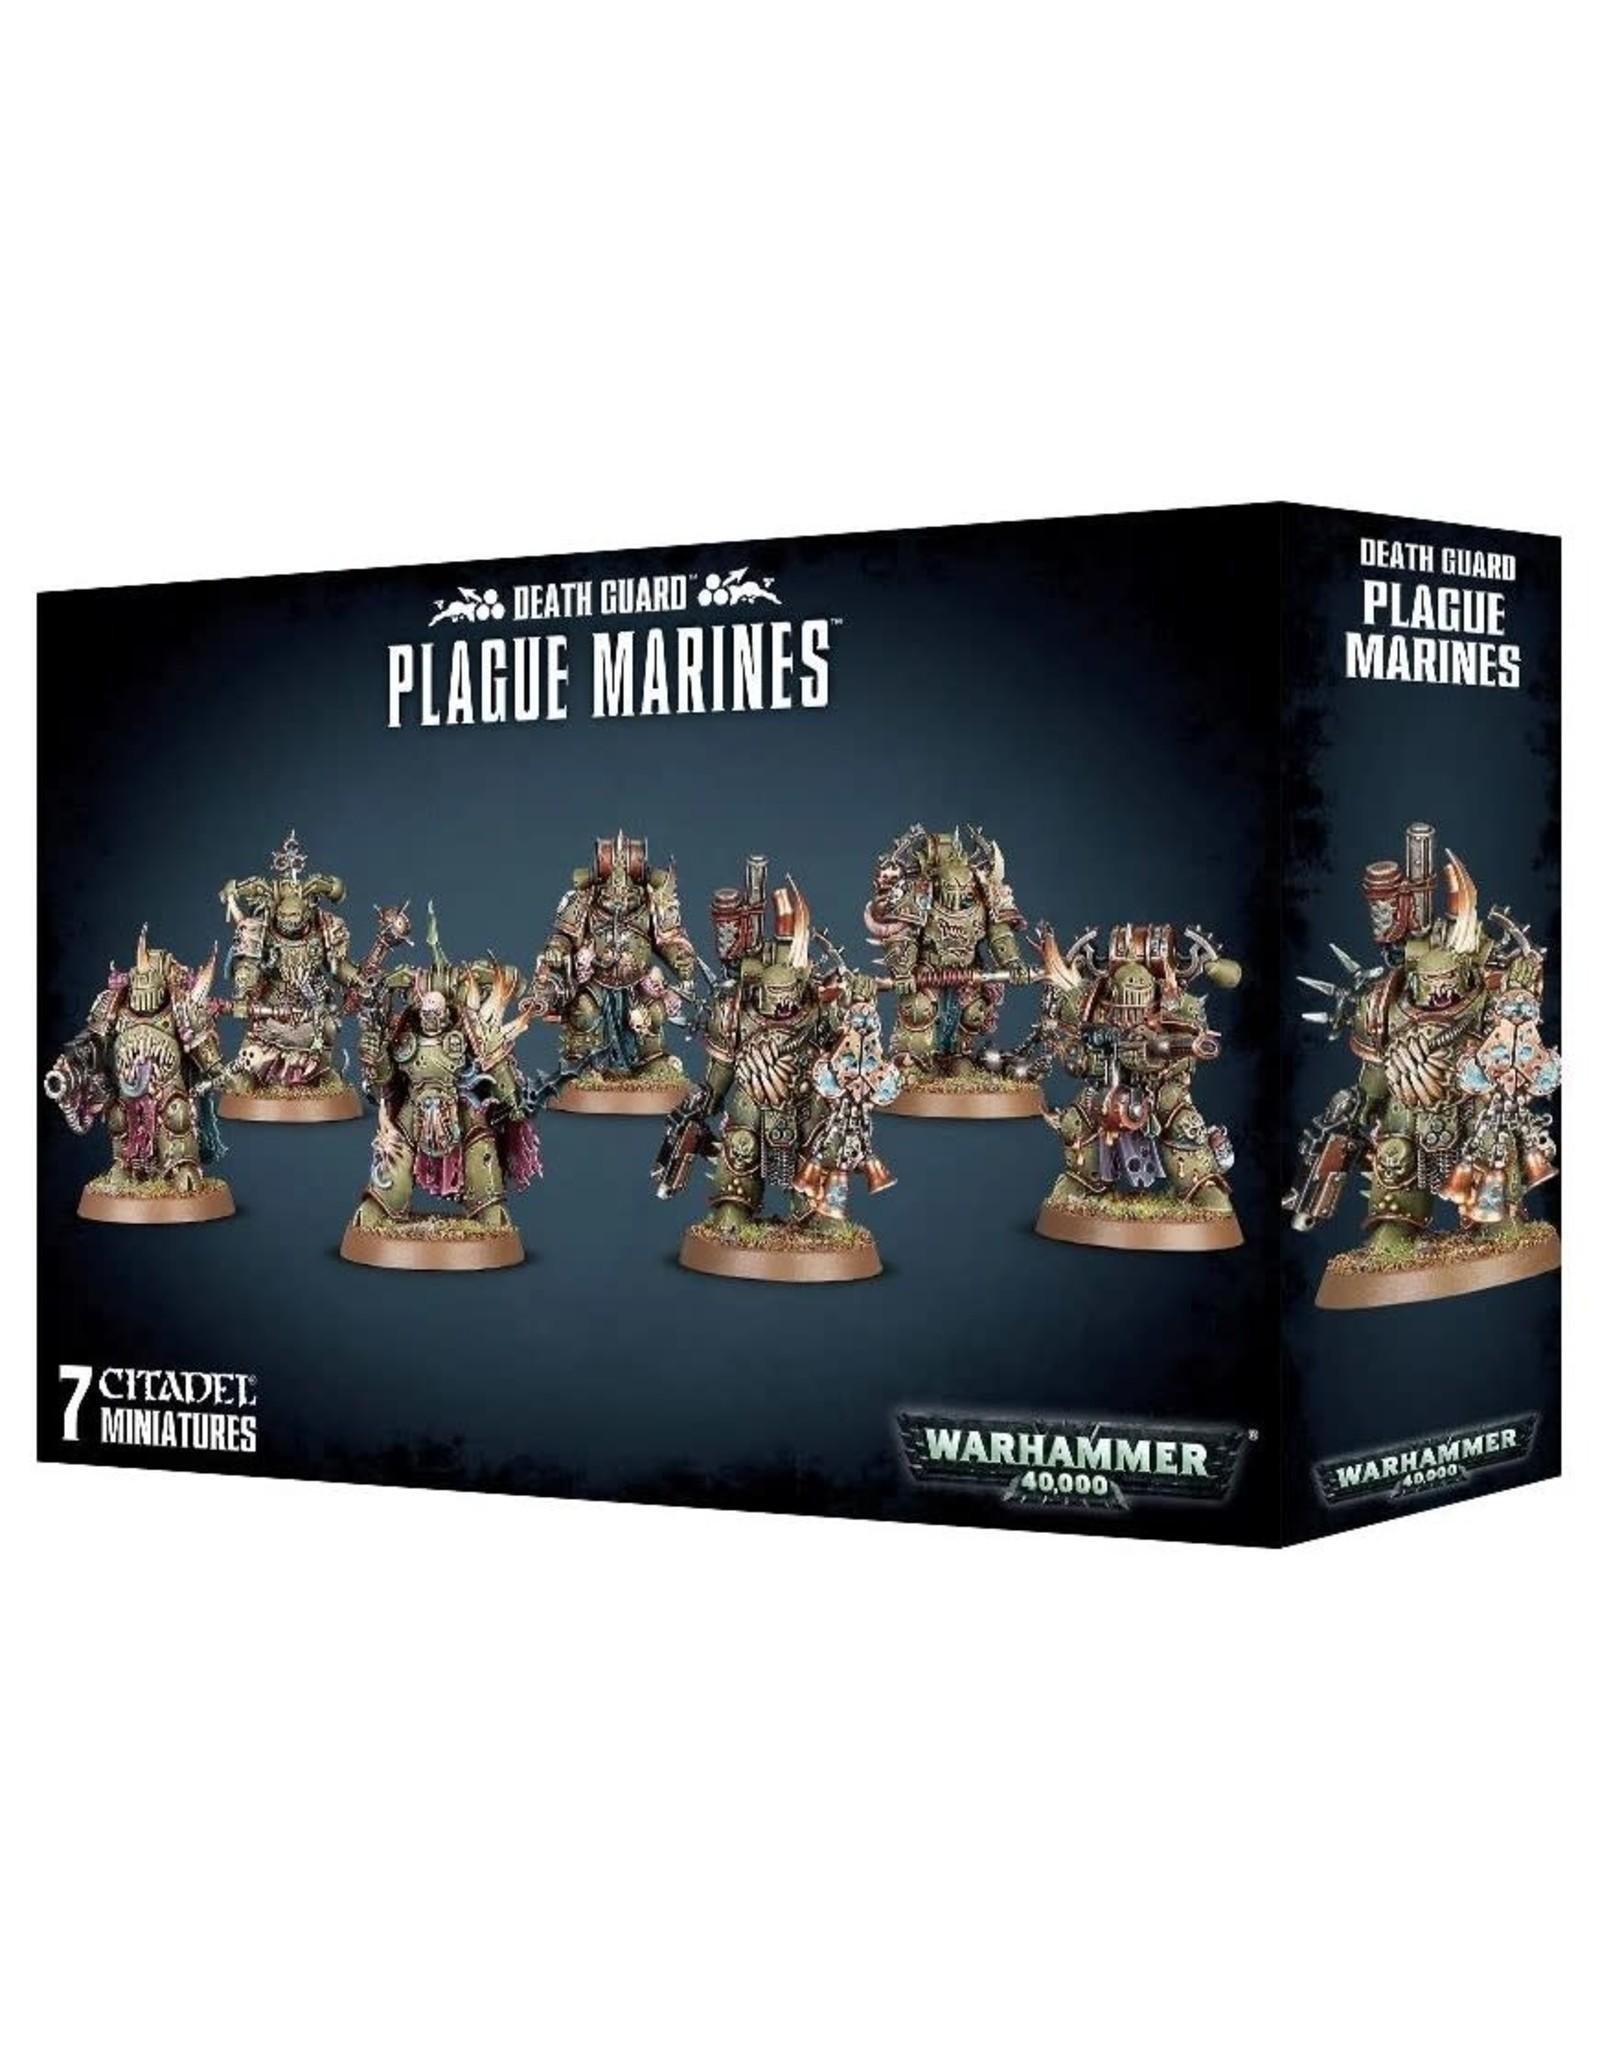 Warhammer 40K WH40K - Death Guard Plague Marines